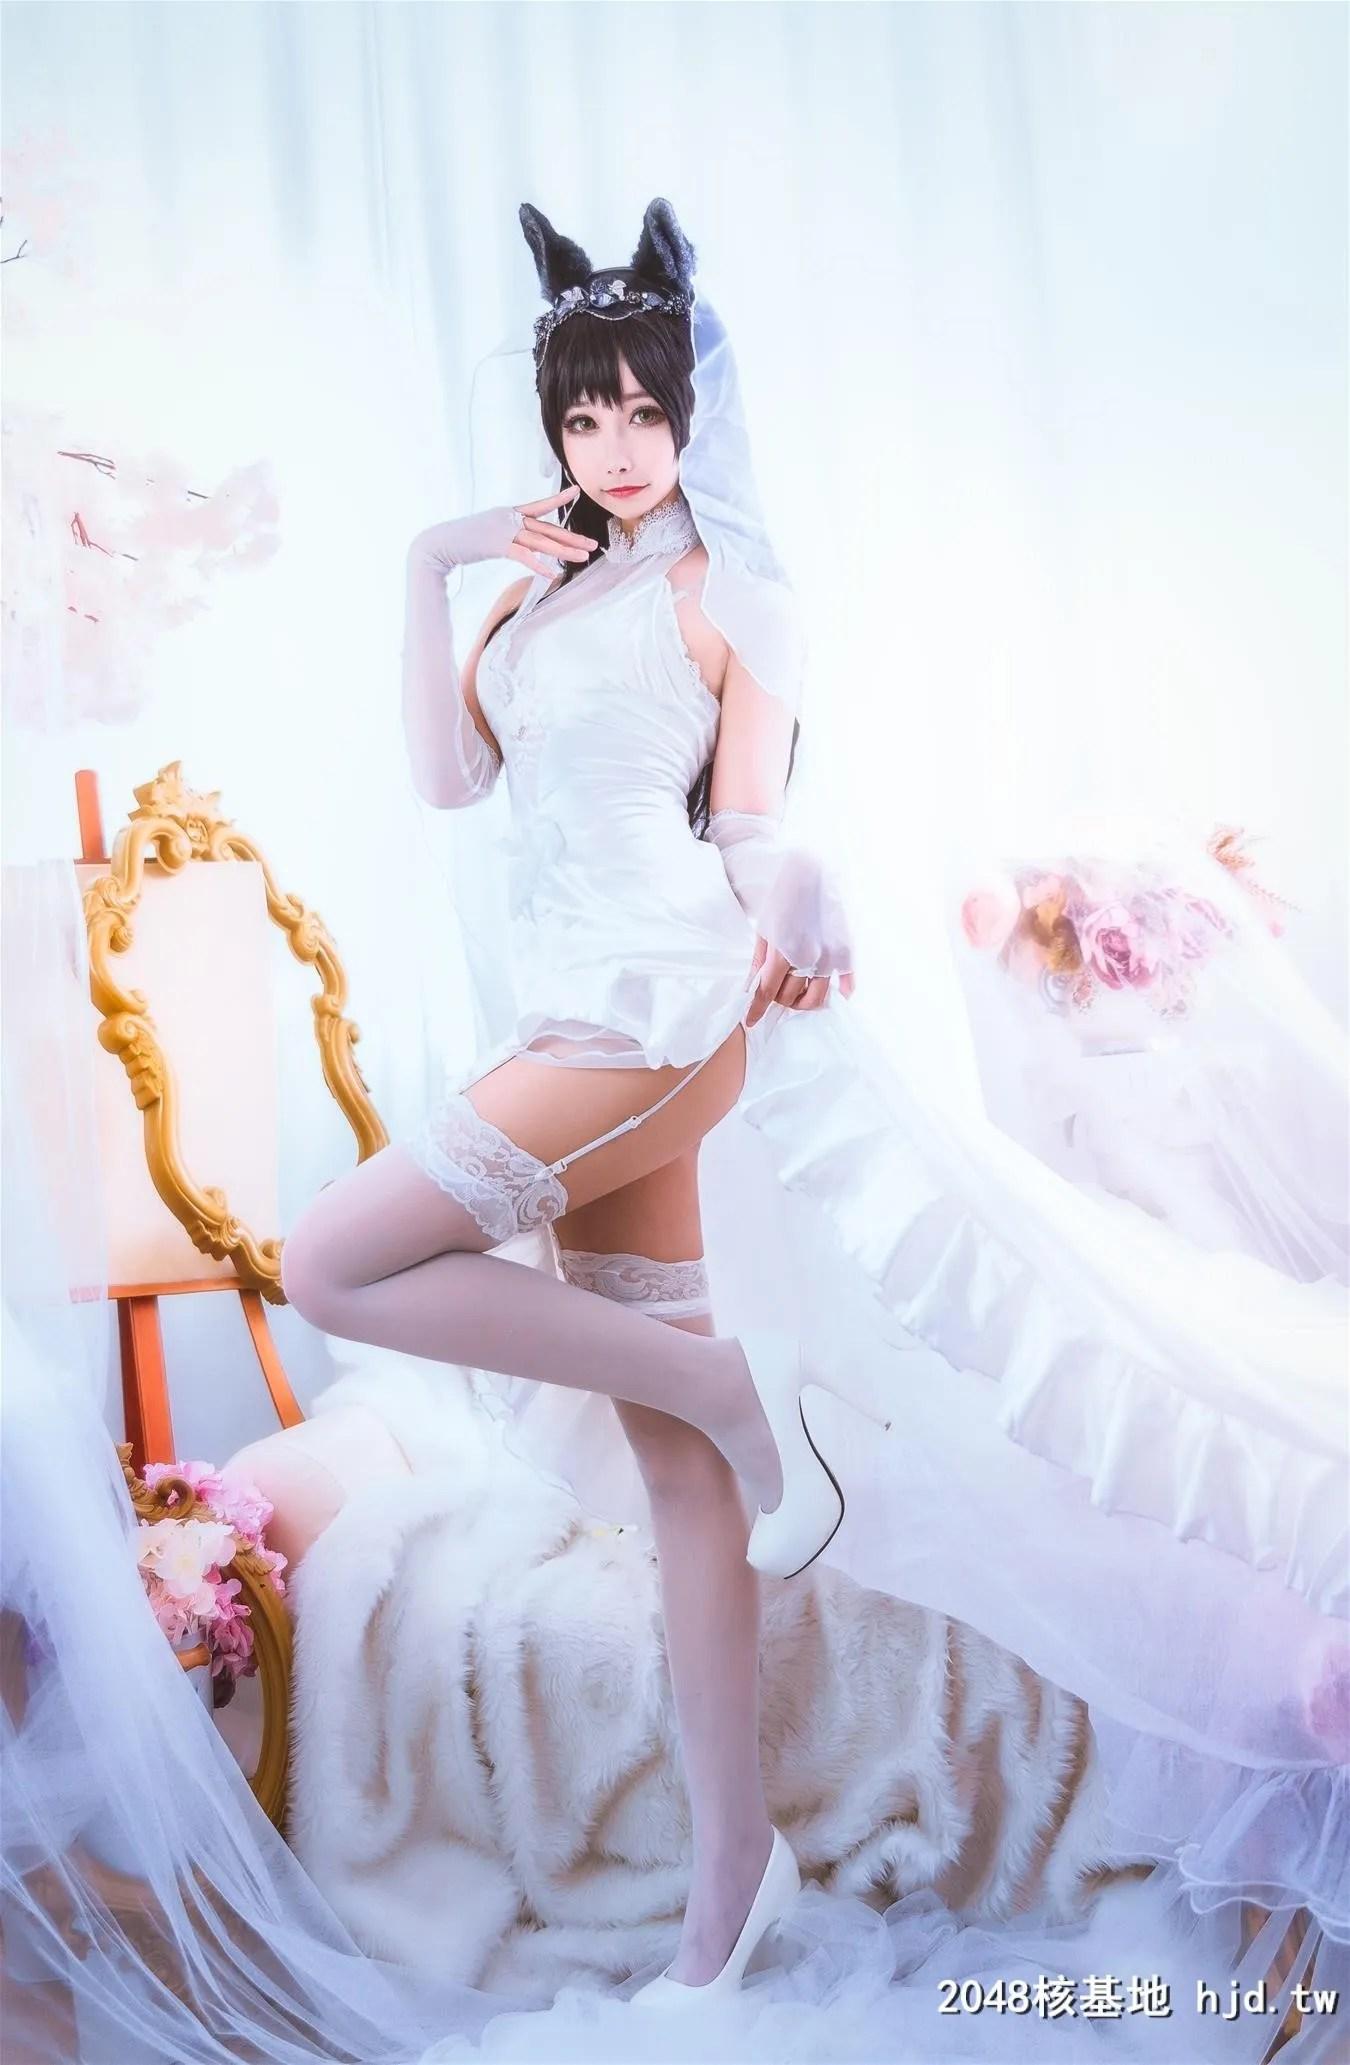 【Momoko葵葵】 爱宕 [26P]插图(9)